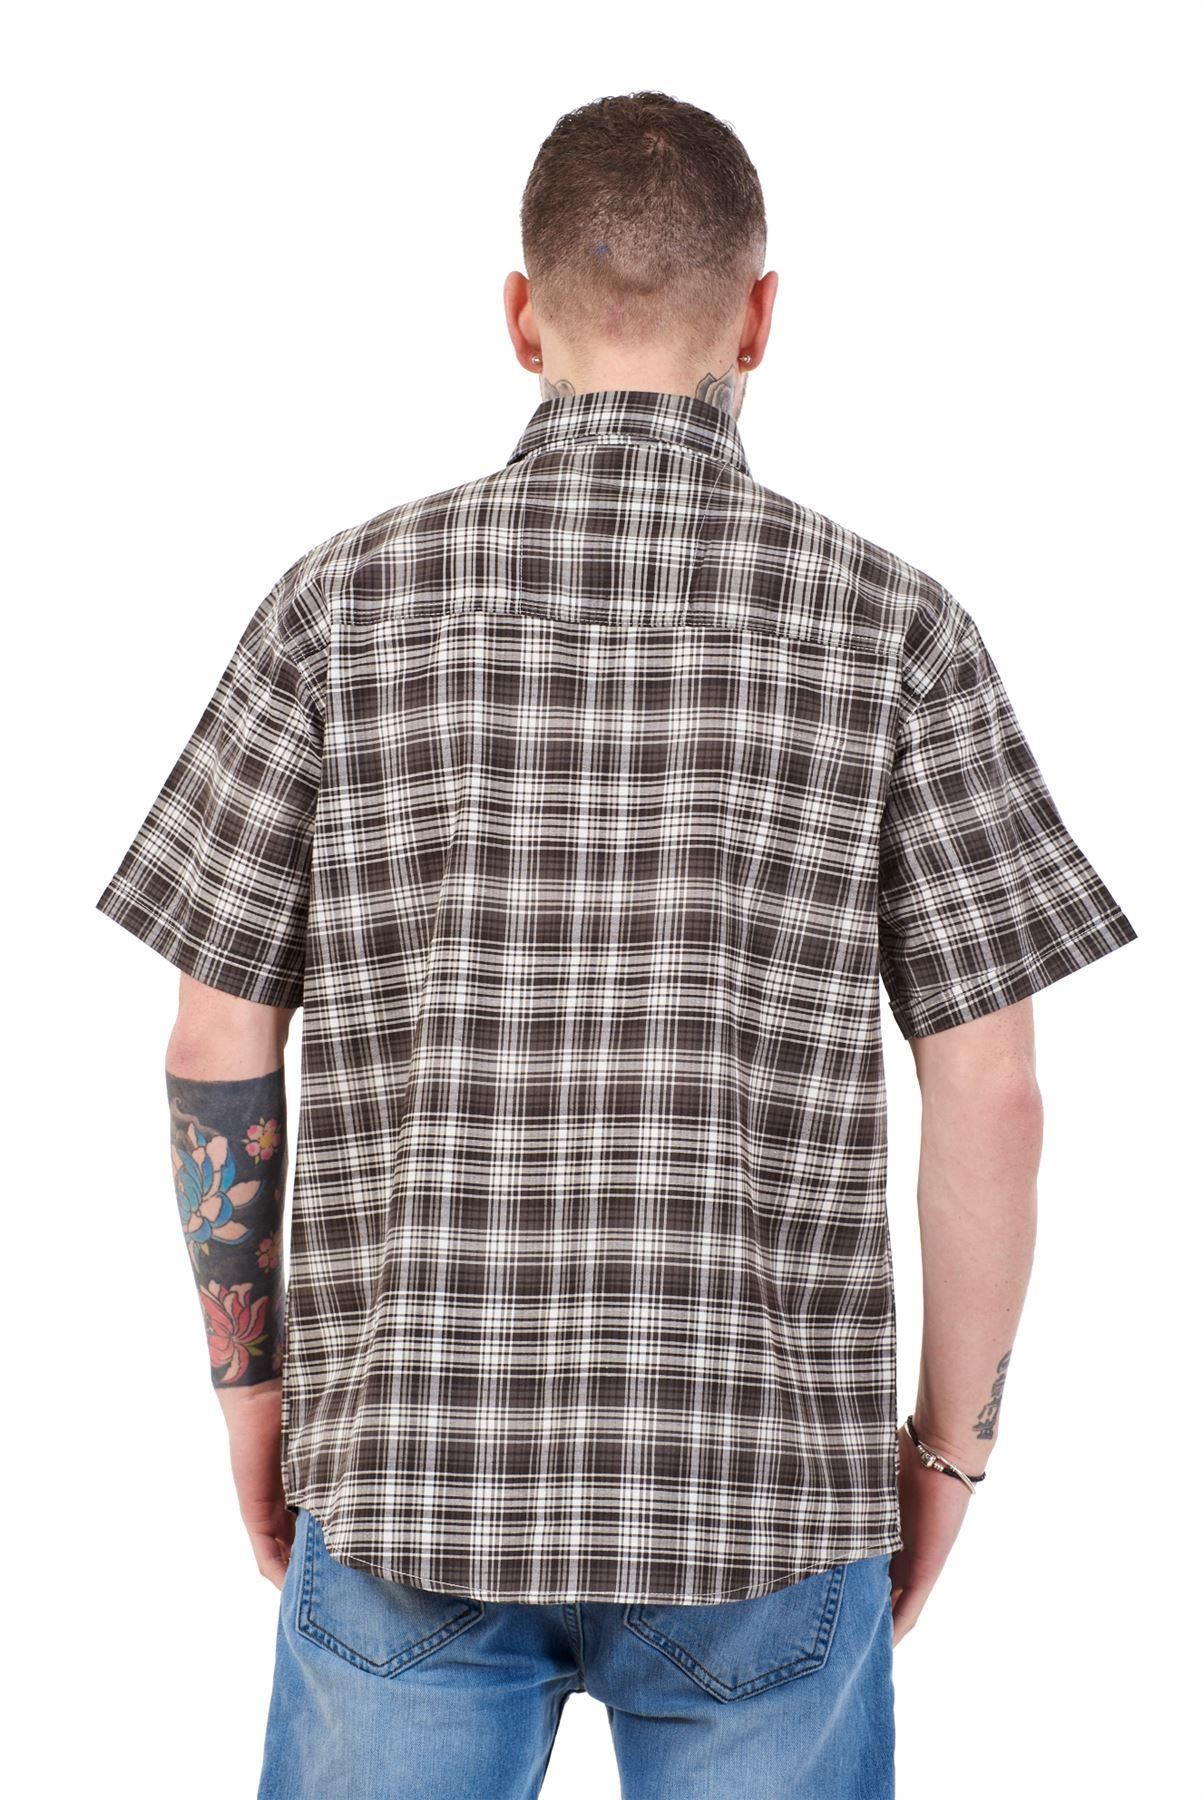 Mens-Regular-Big-Size-Shirts-Checked-Cotton-Blend-Casual-Short-Sleeve-Blue-M-5XL thumbnail 4